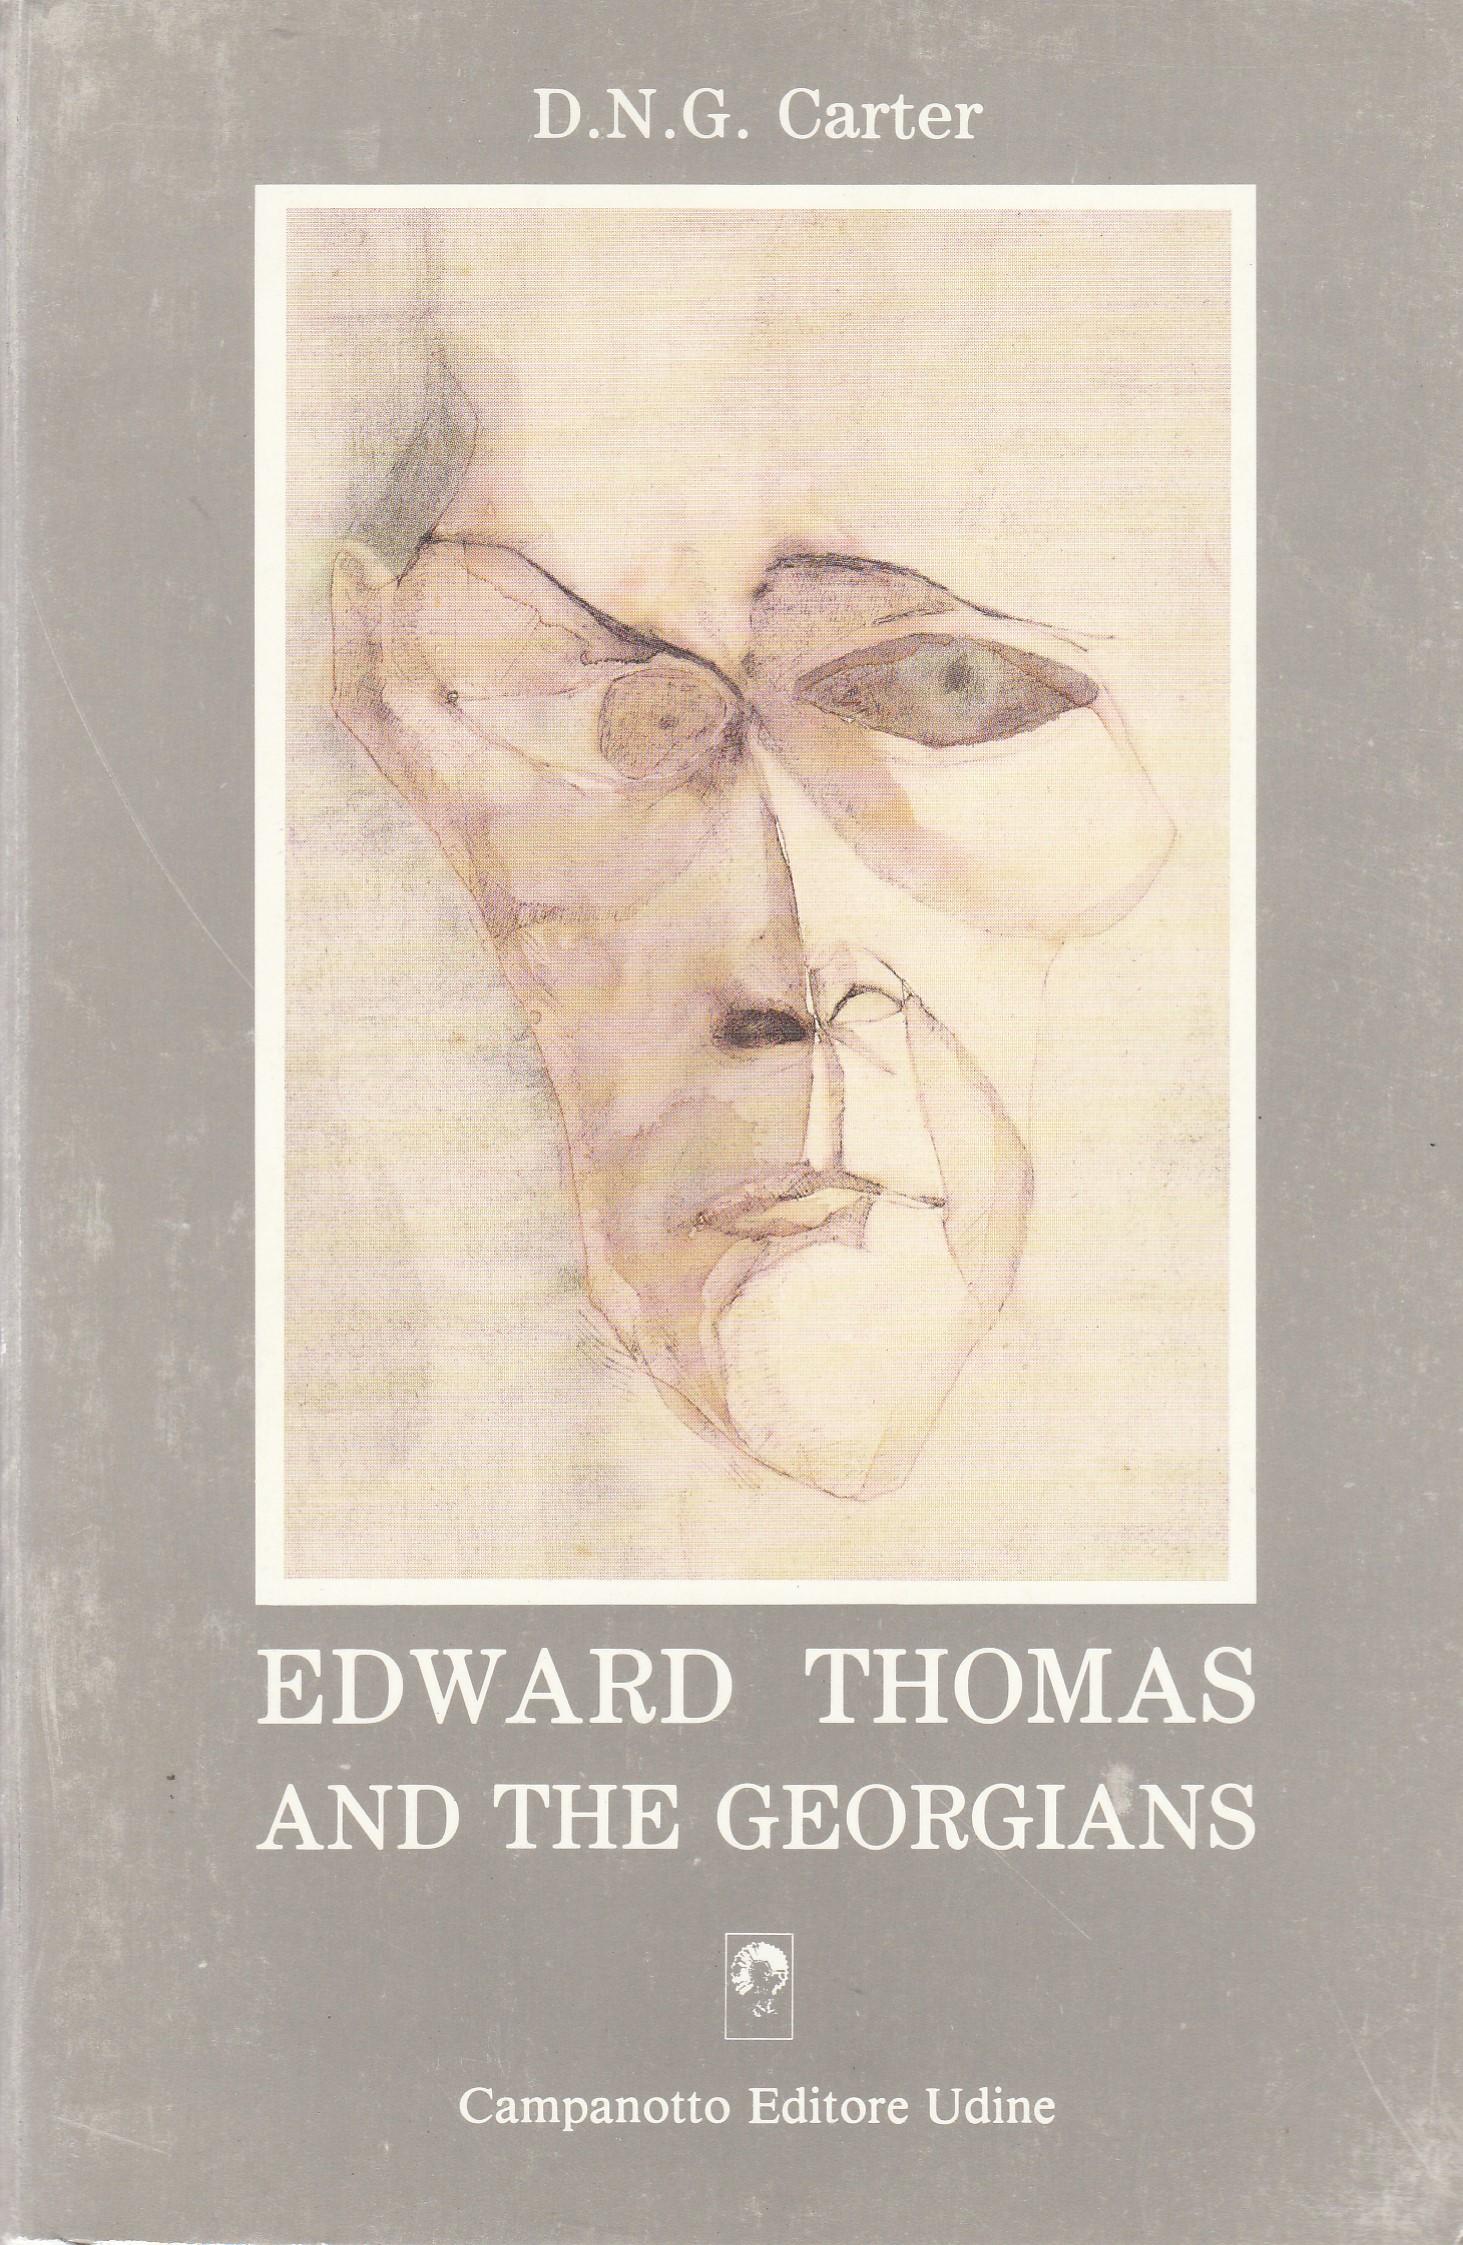 Edward Thomas and the Georgians